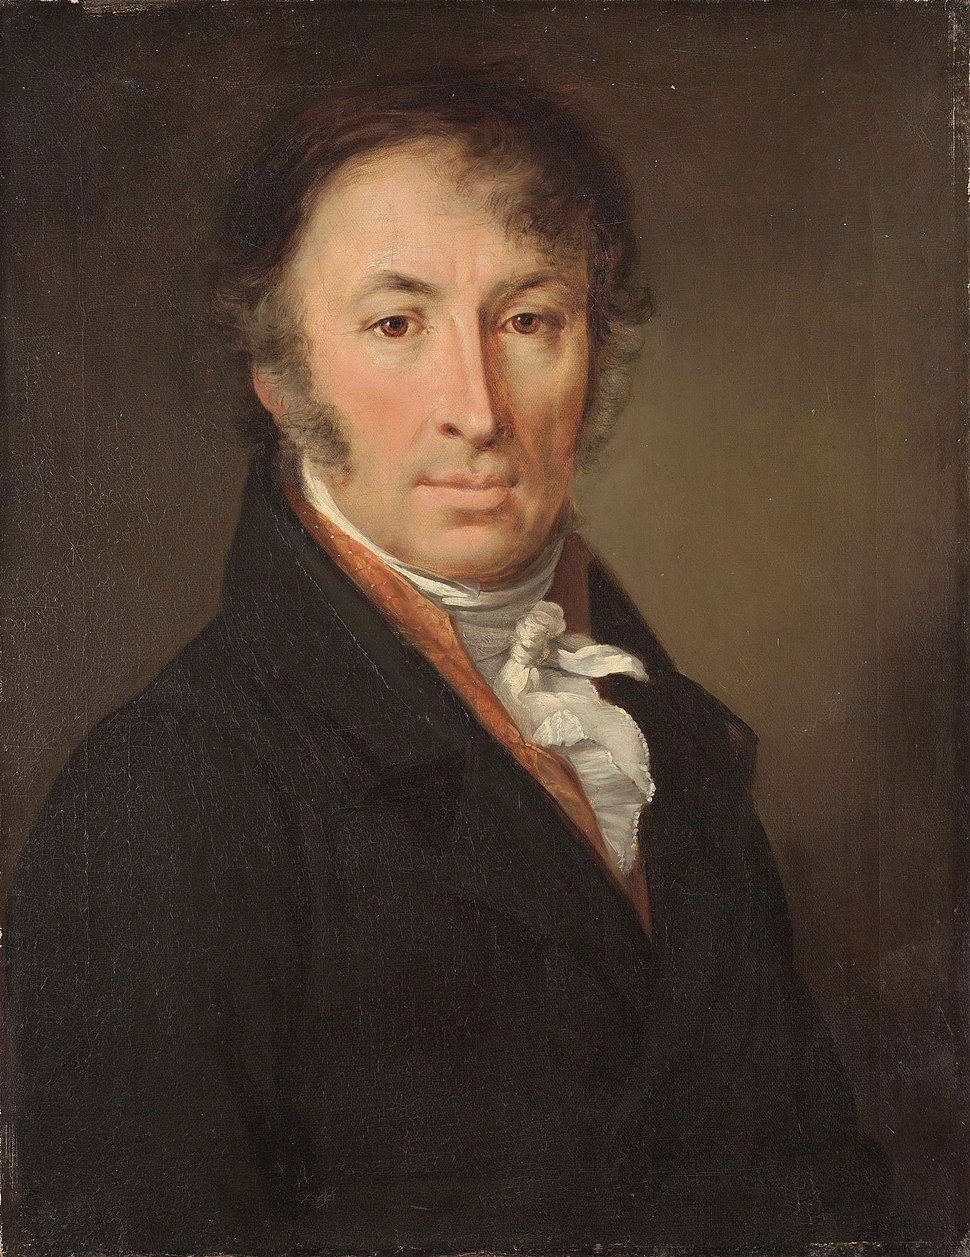 Portrait of Karamzin by Vasily Tropinin, 1818.